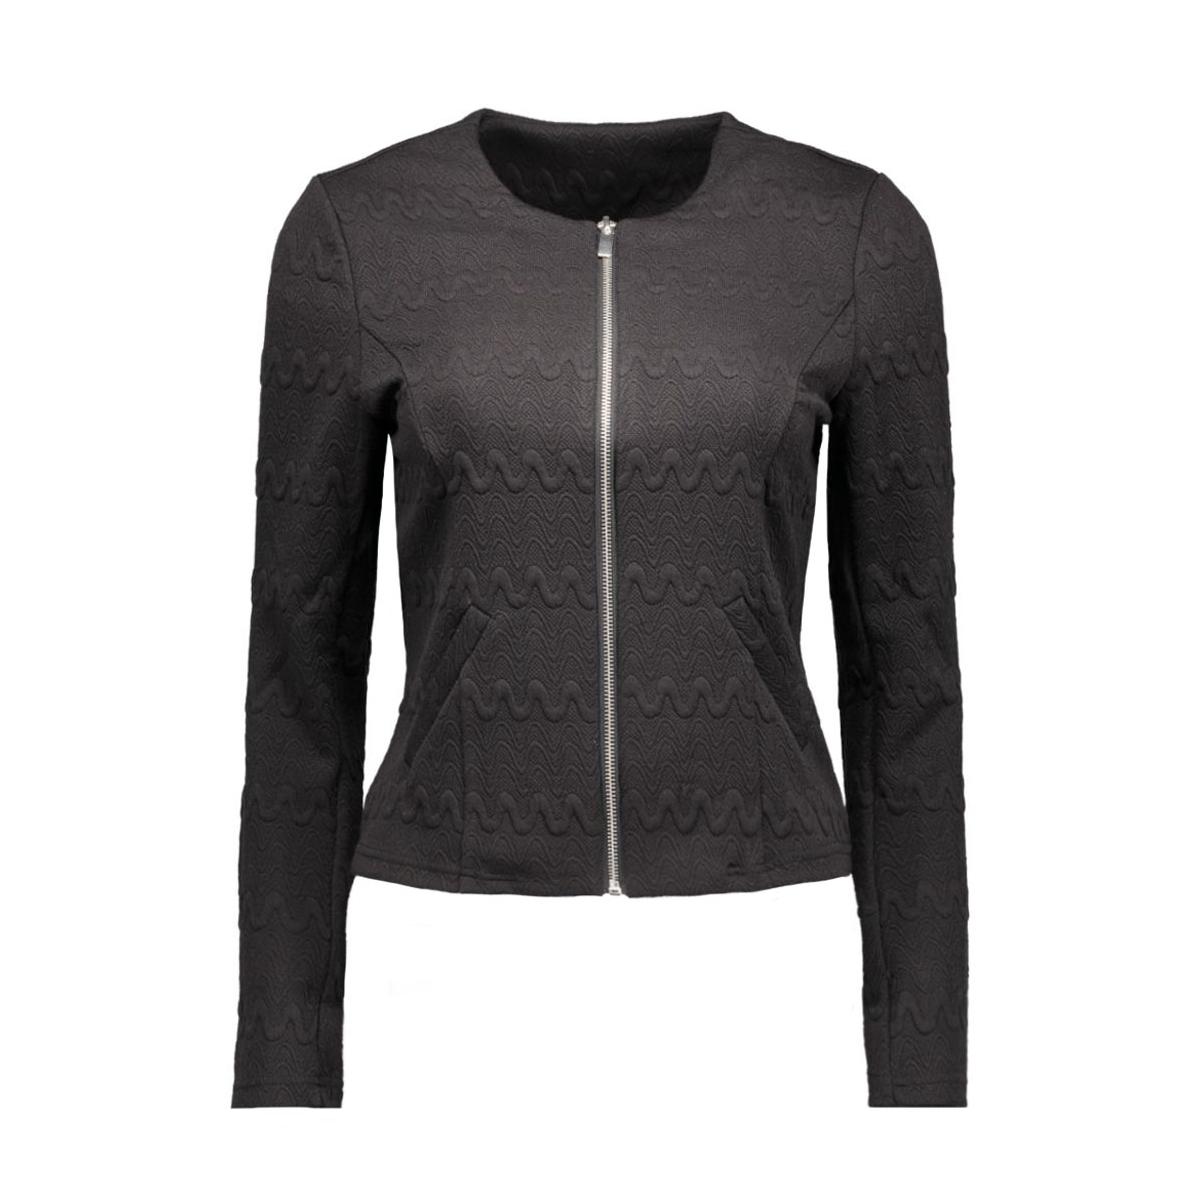 vmstructure l/s blazer a 10160277 vero moda blazer black/zipper